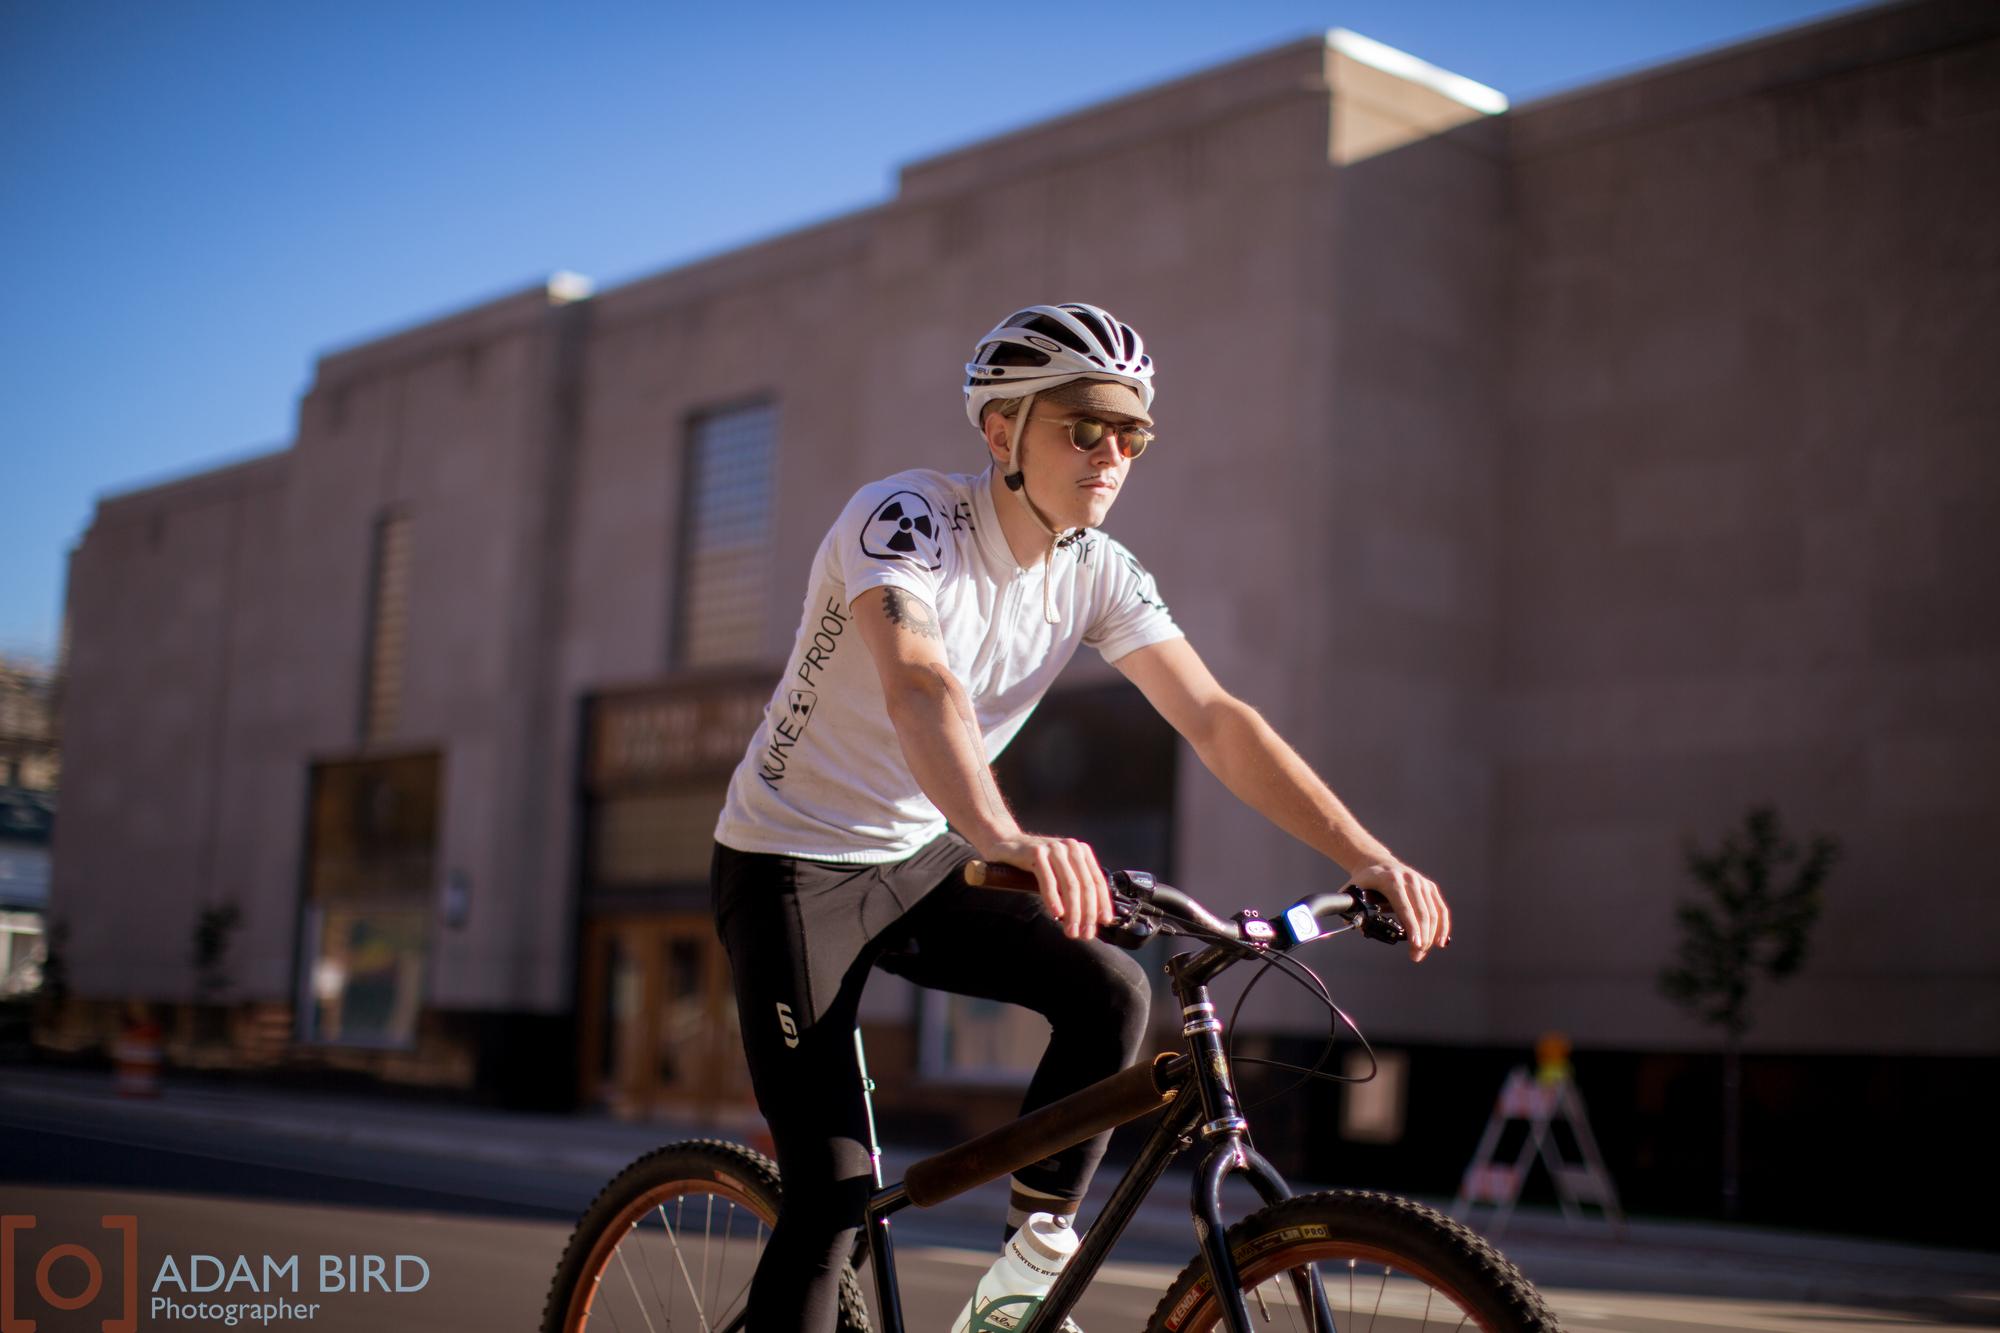 josh_mcvety_bike_lanes_05.JPG